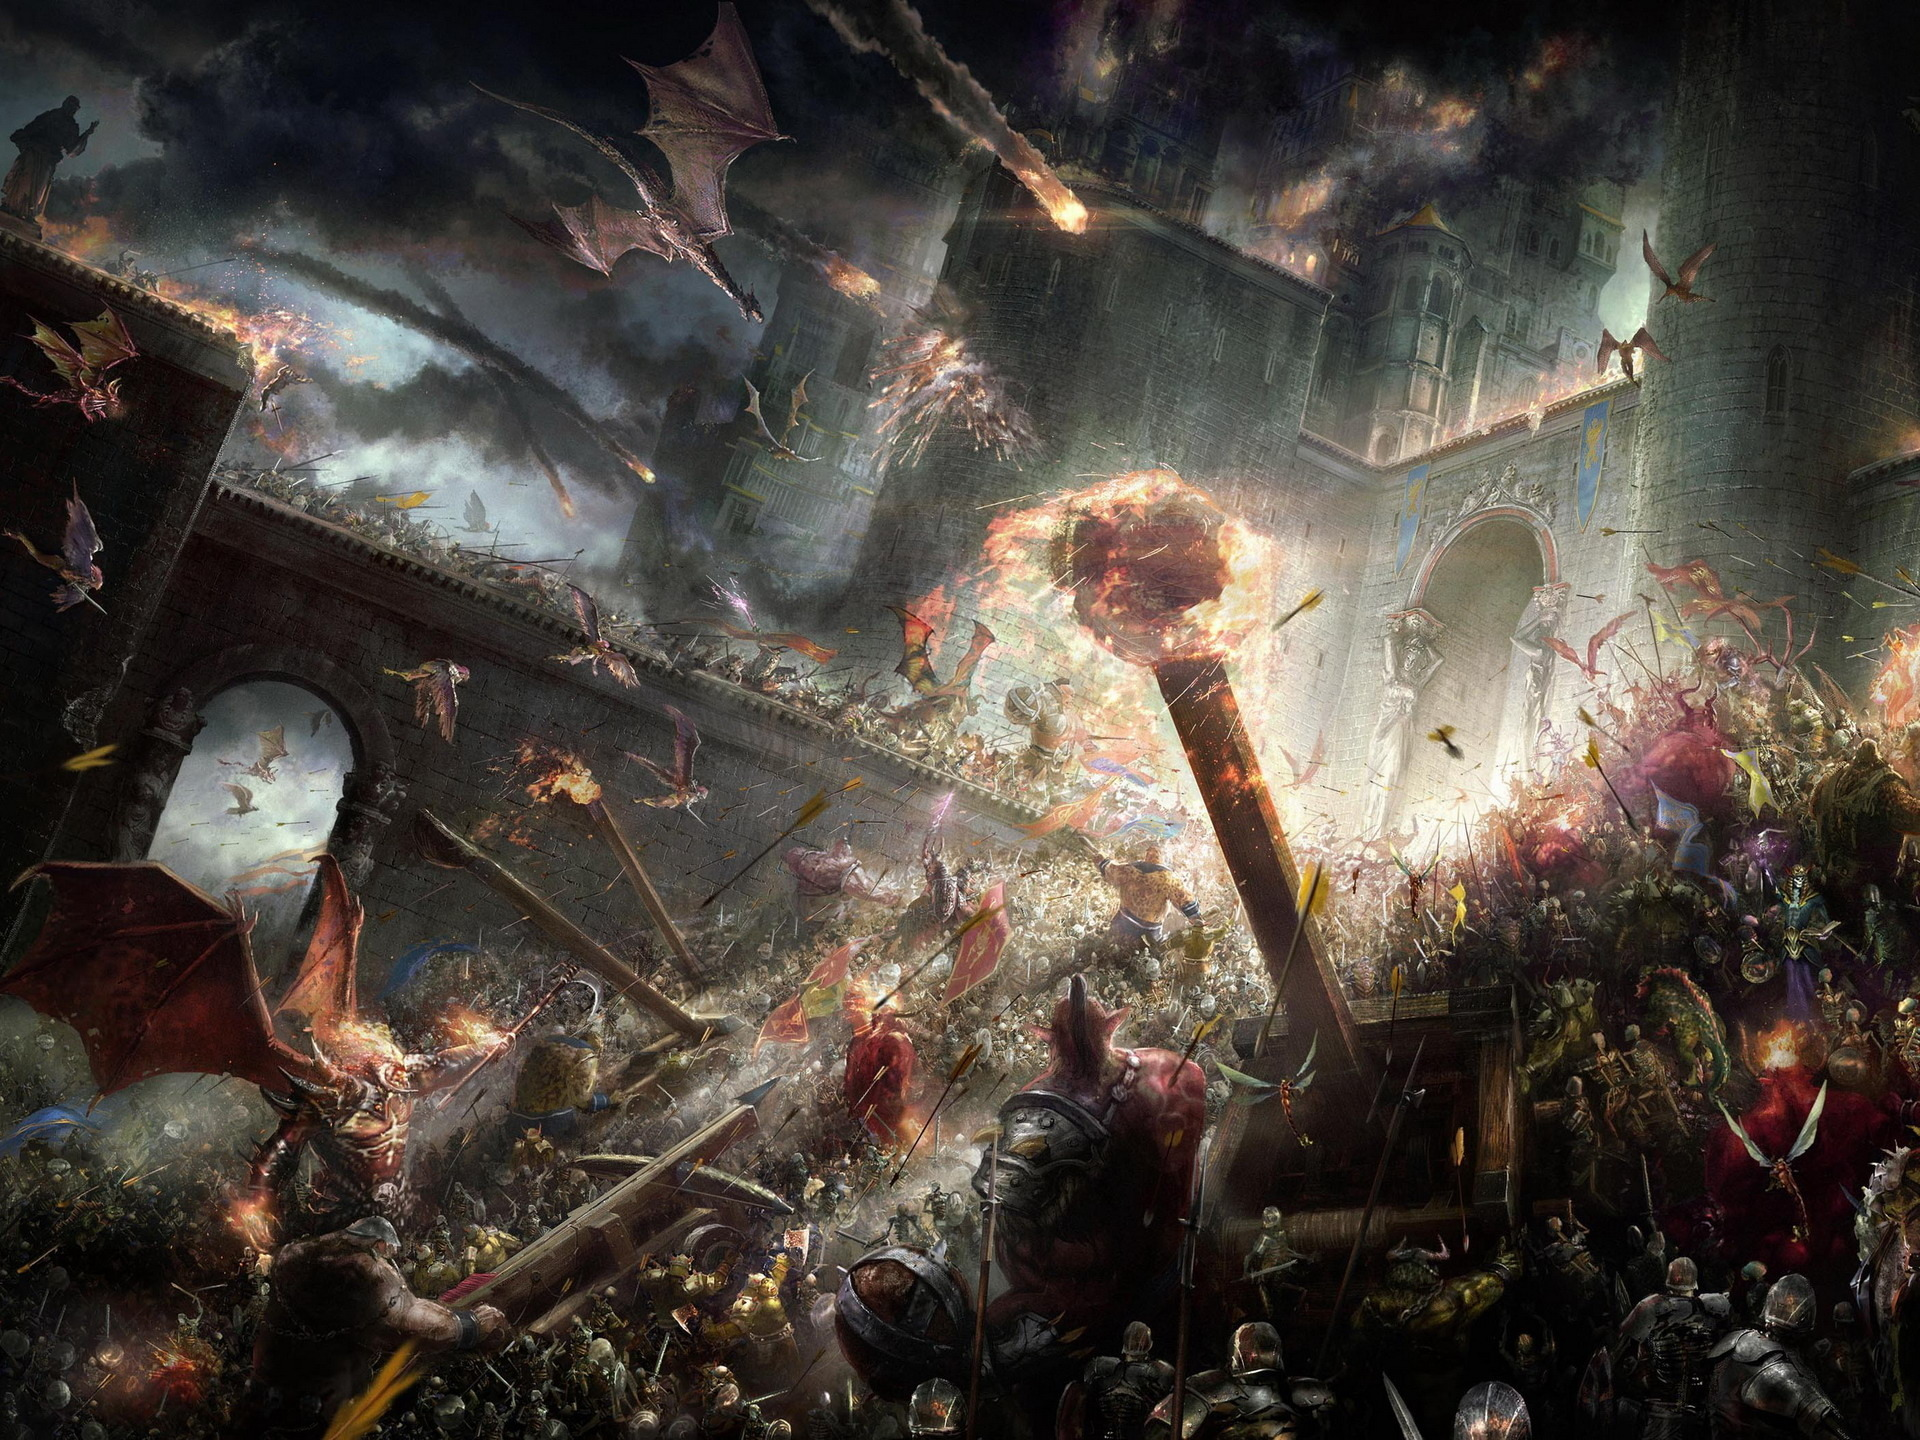 Género Fantástico - Batalla  Dragones Guerreros Weapon Castillos Fire Fondo de Pantalla